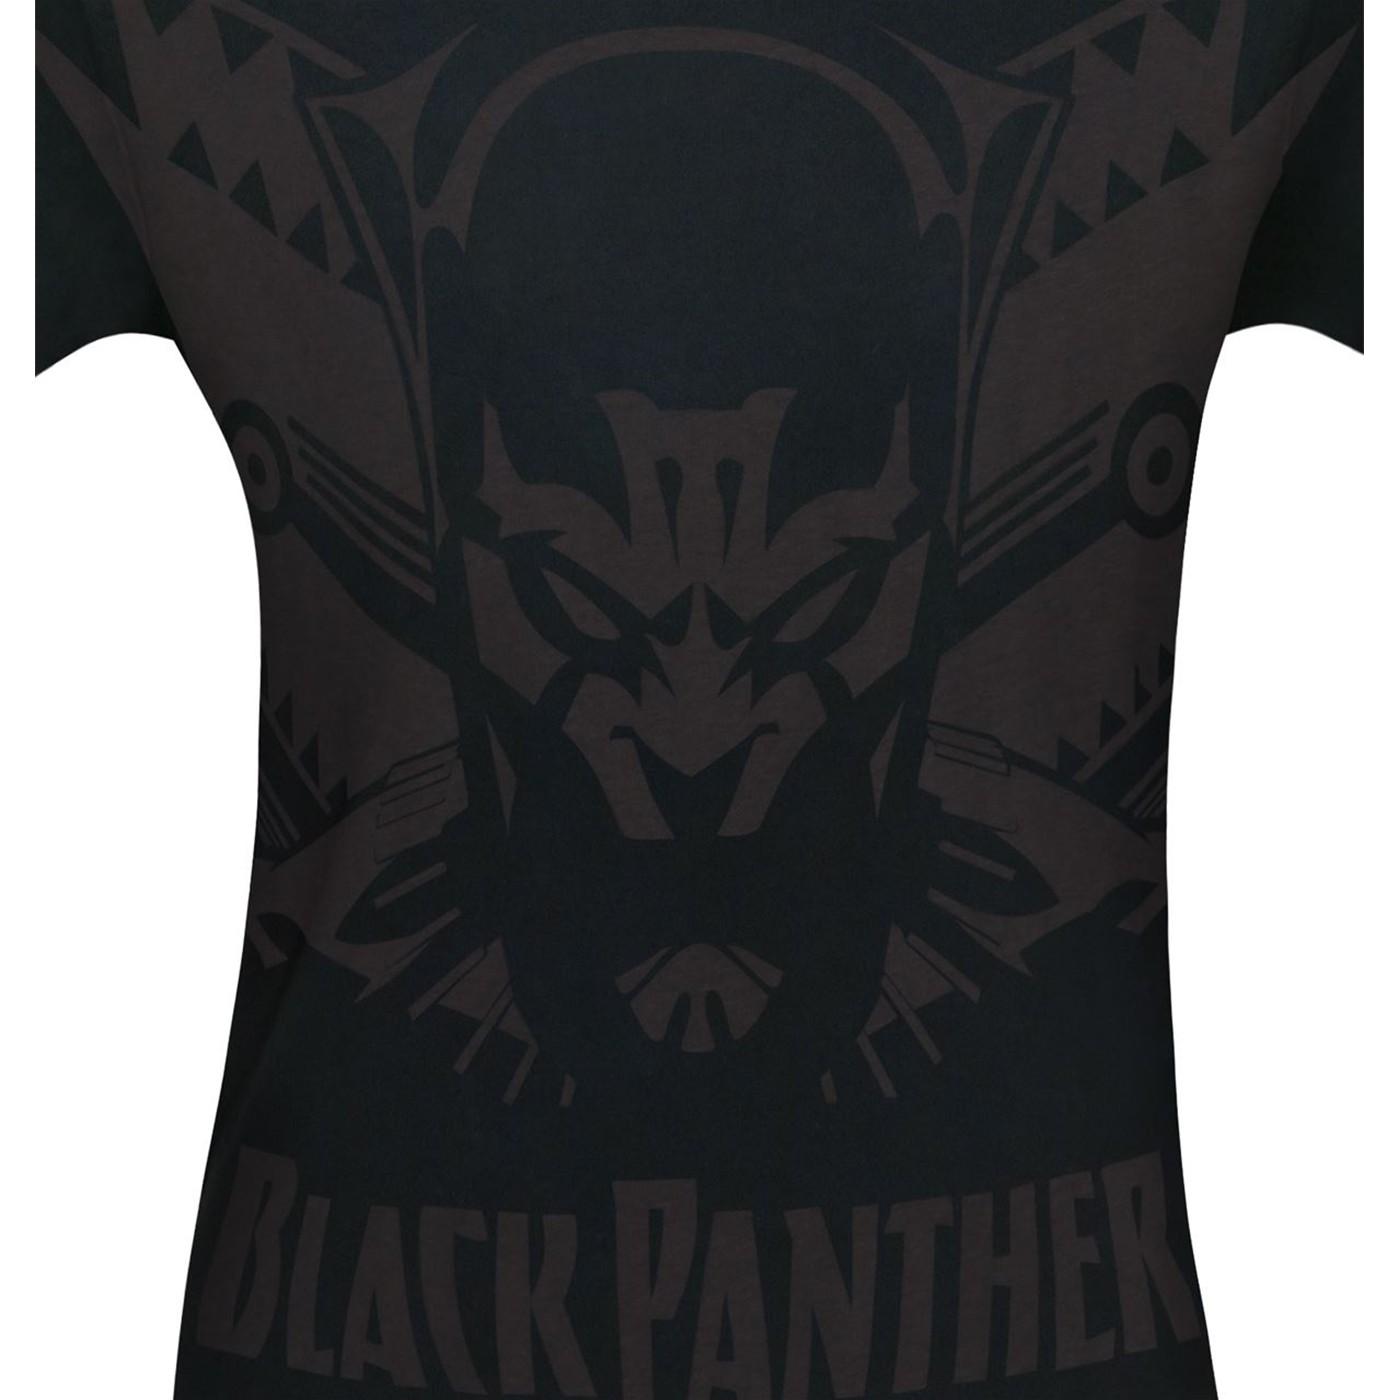 Black Panther Shadow Cat Men's T-Shirt